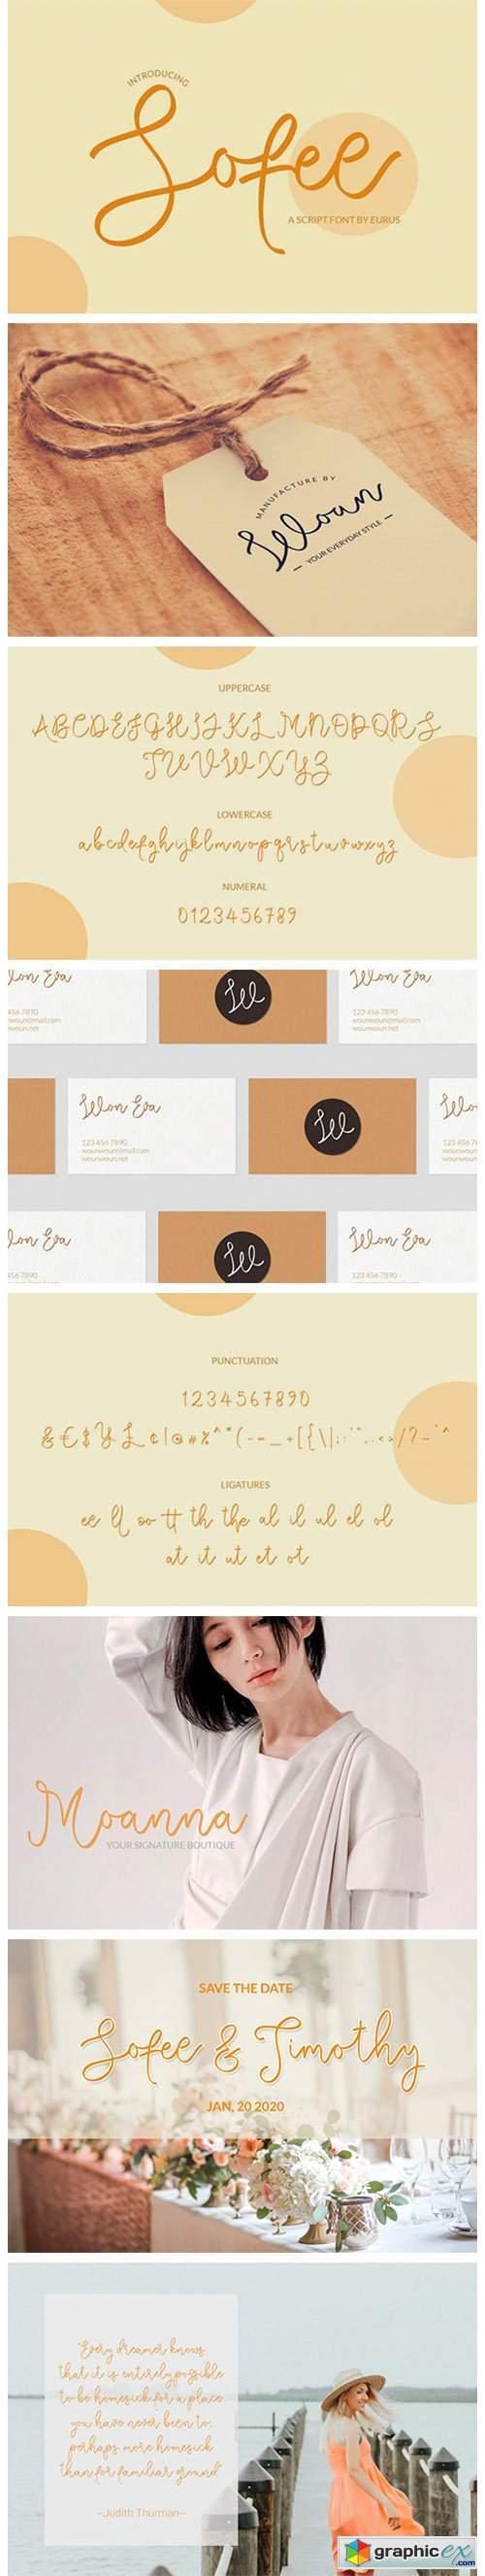 Sofee Font